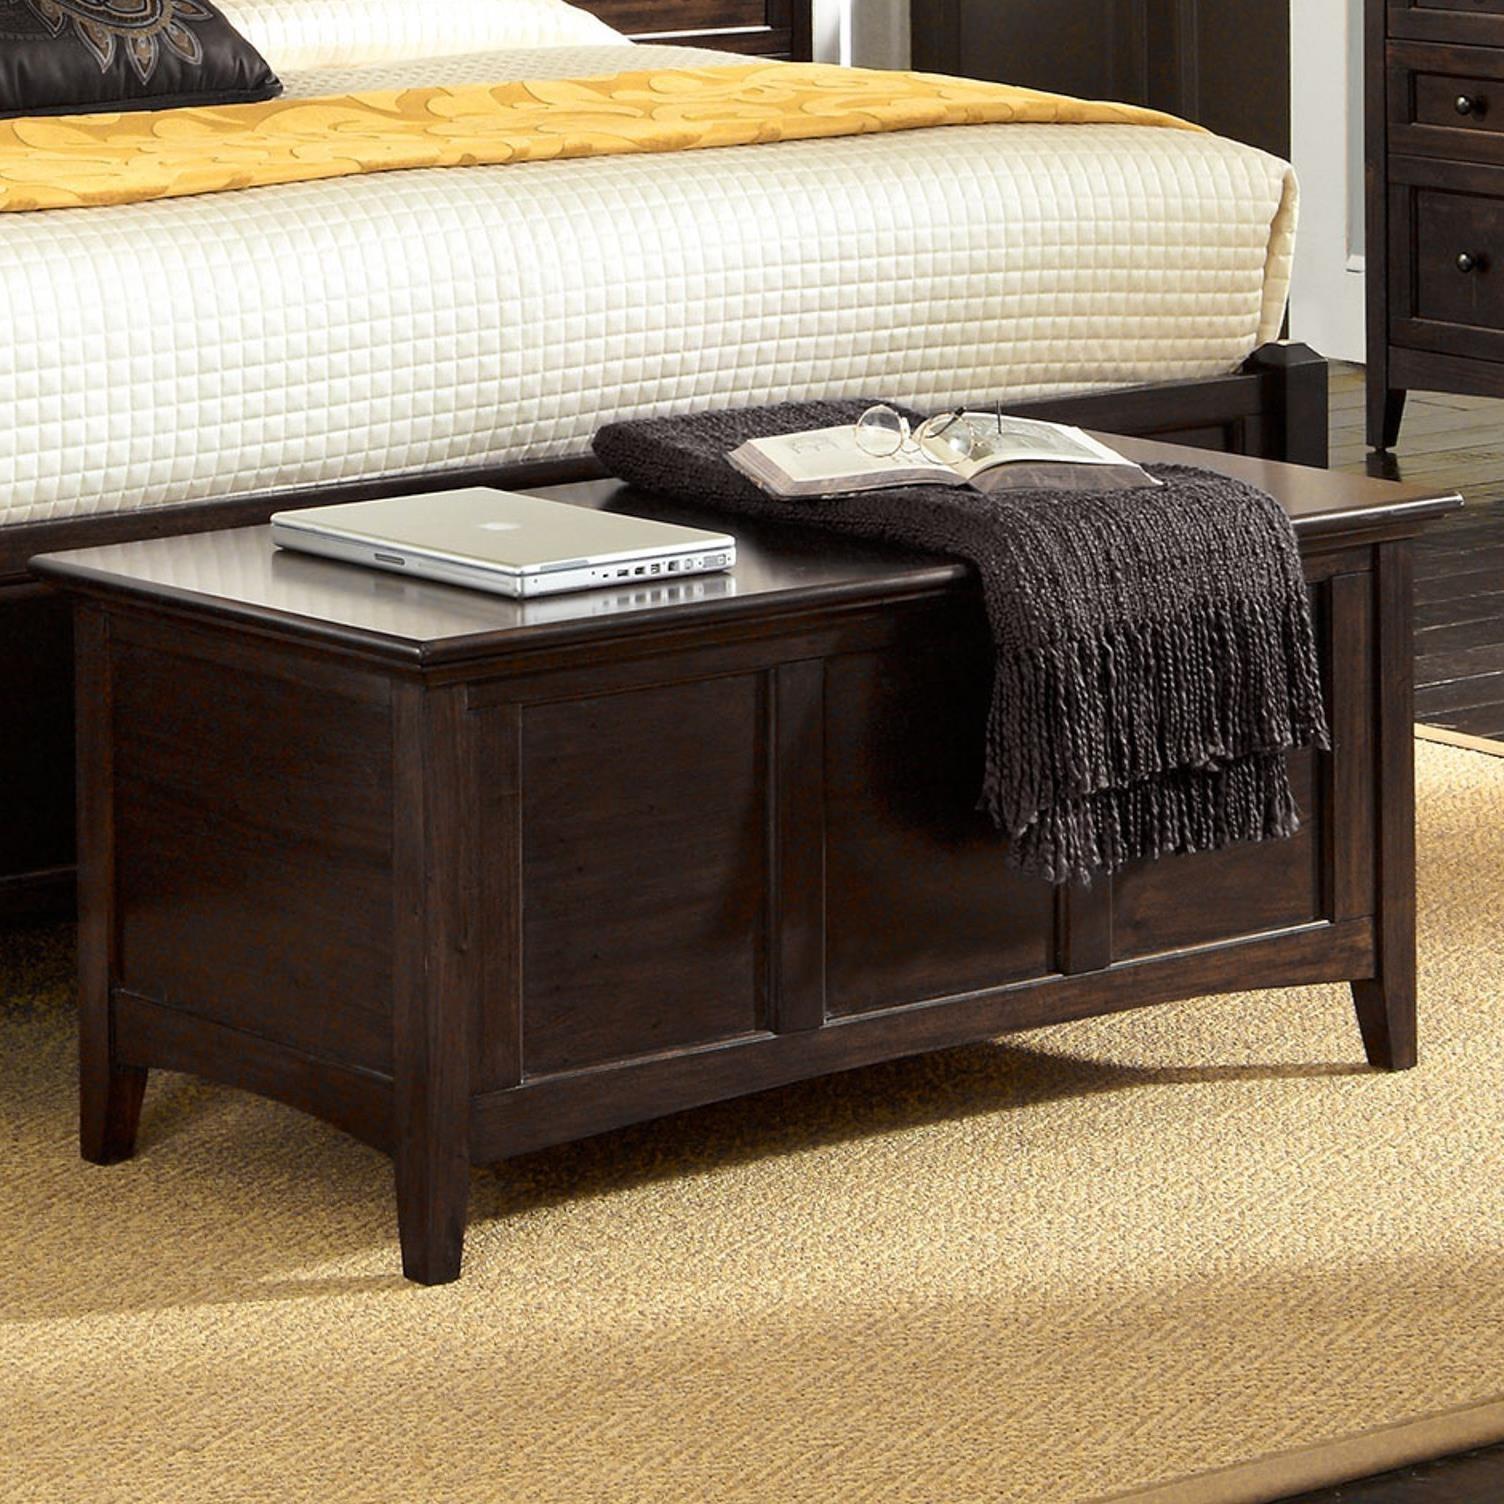 Westlake Cedar Chest by A-A at Walker's Furniture